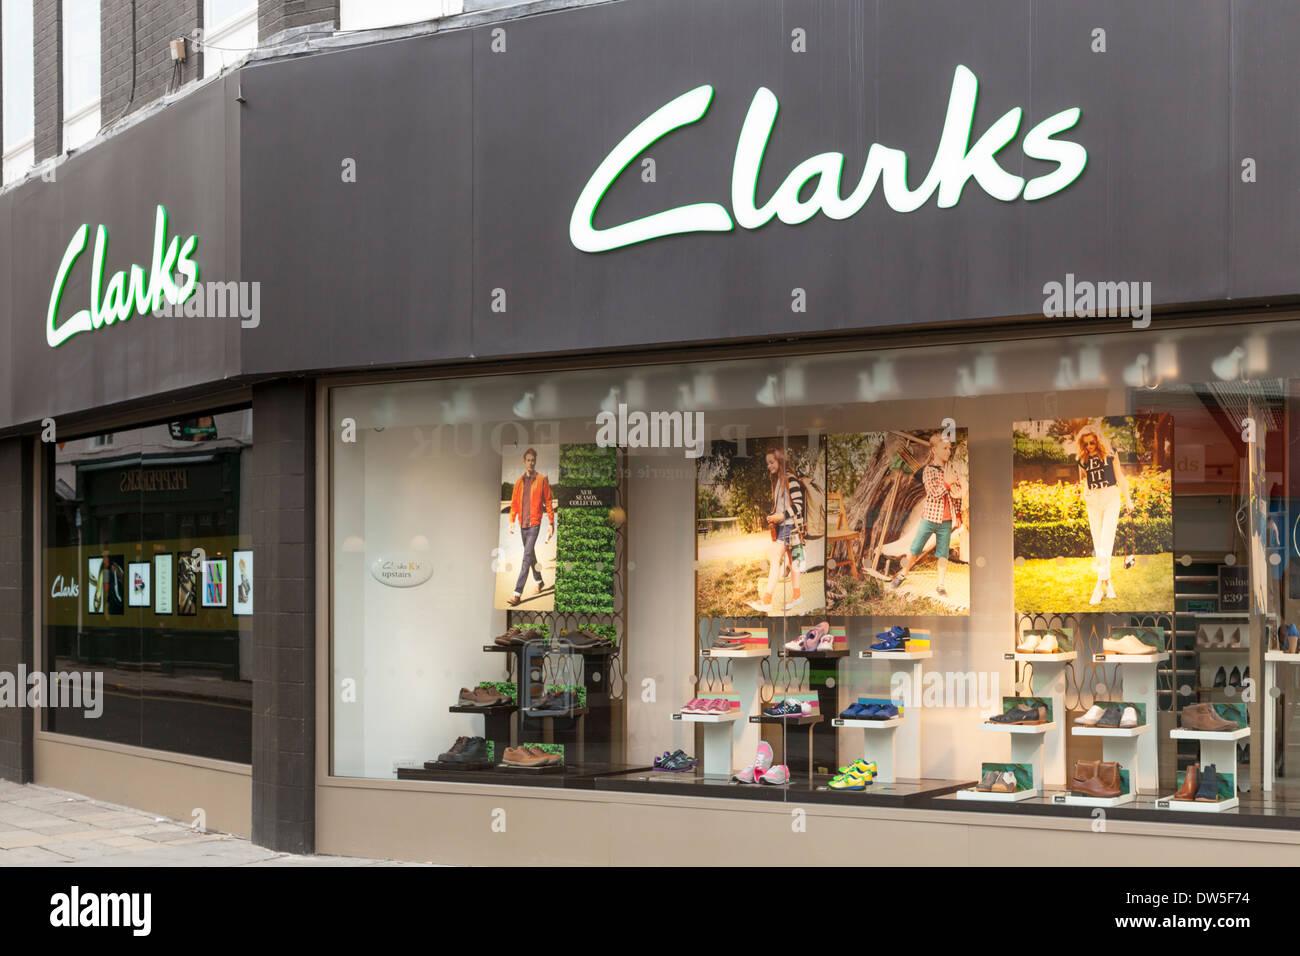 Clarks scarpe. Un Clarks negozio di scarpe a Nottingham